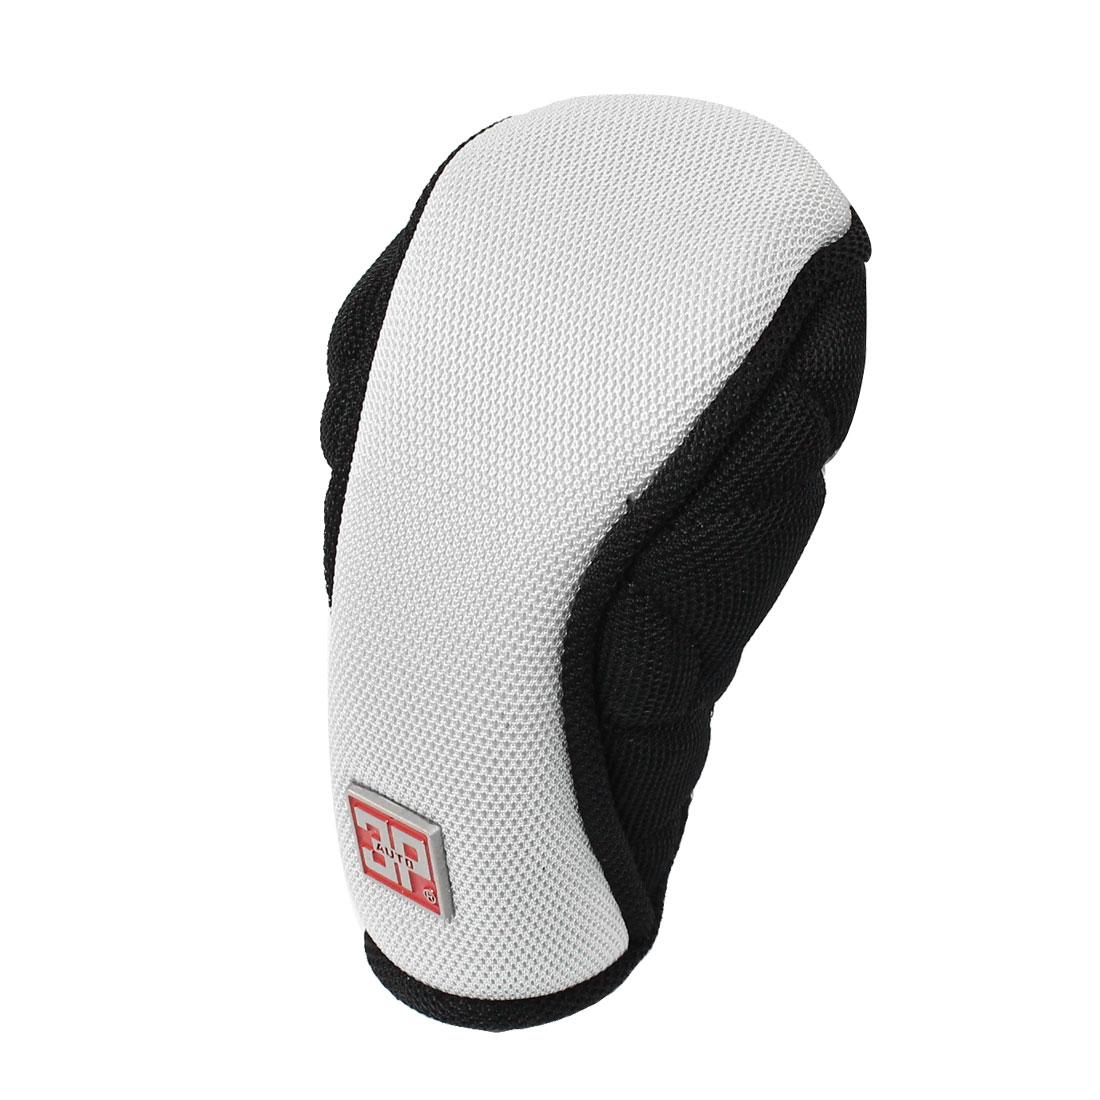 Black Gray Nylon Car Shift Hand Gear Knob Lever Cover Protector